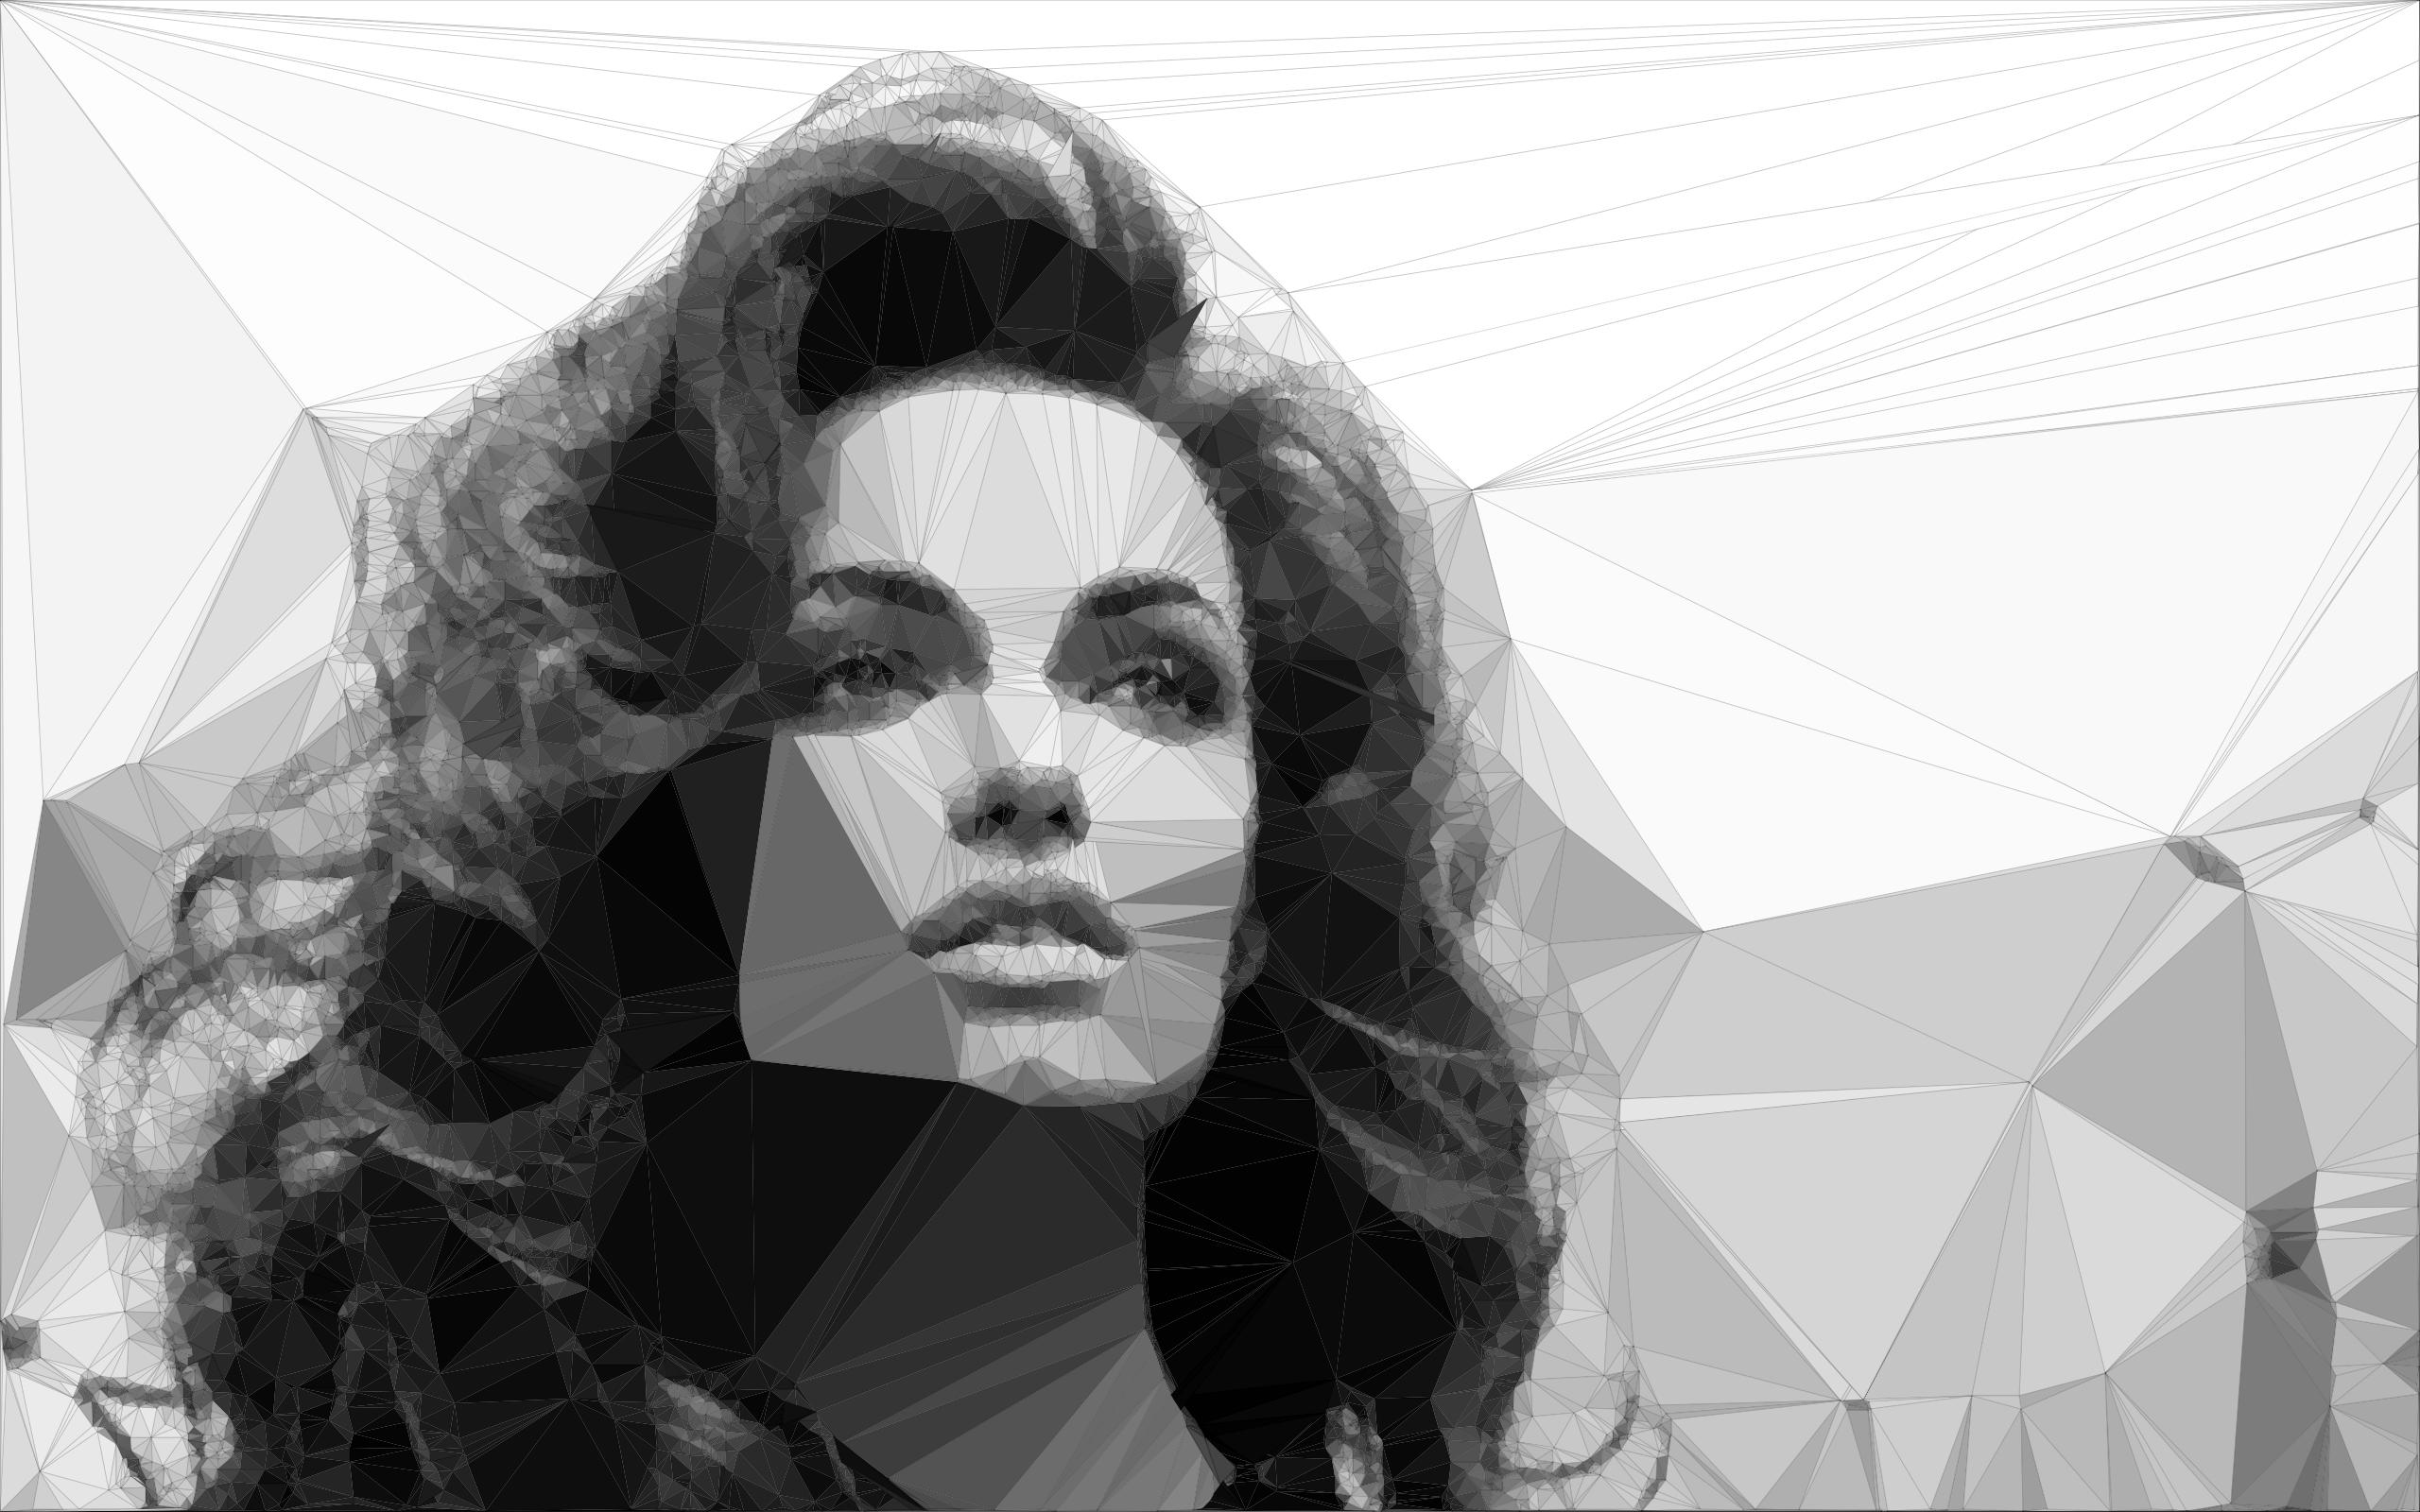 Example of image triangulation